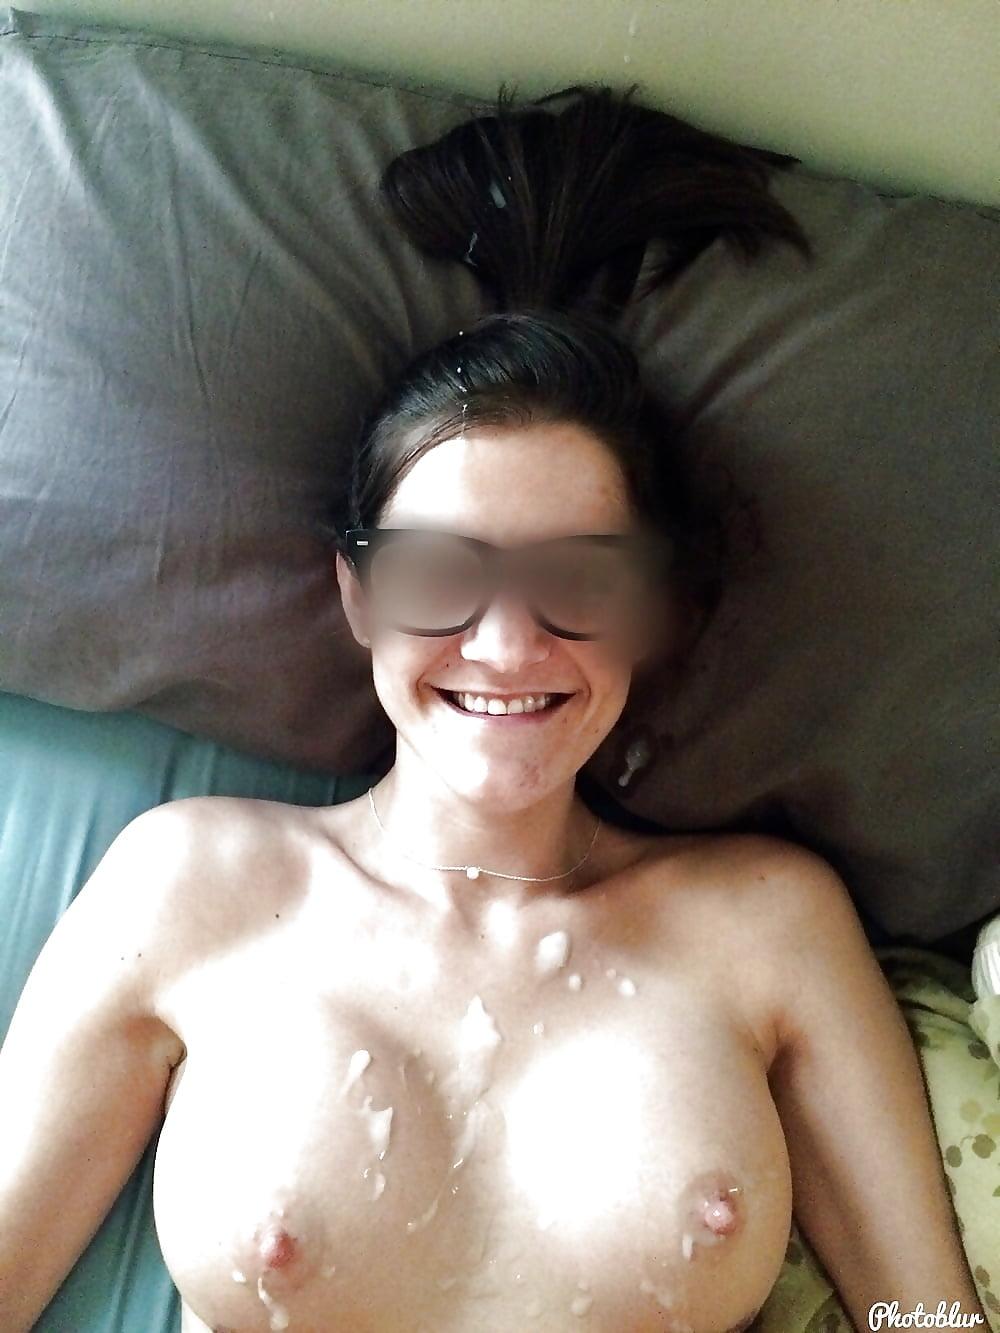 ashley-alicia-facials-decent-looking-naked-girl